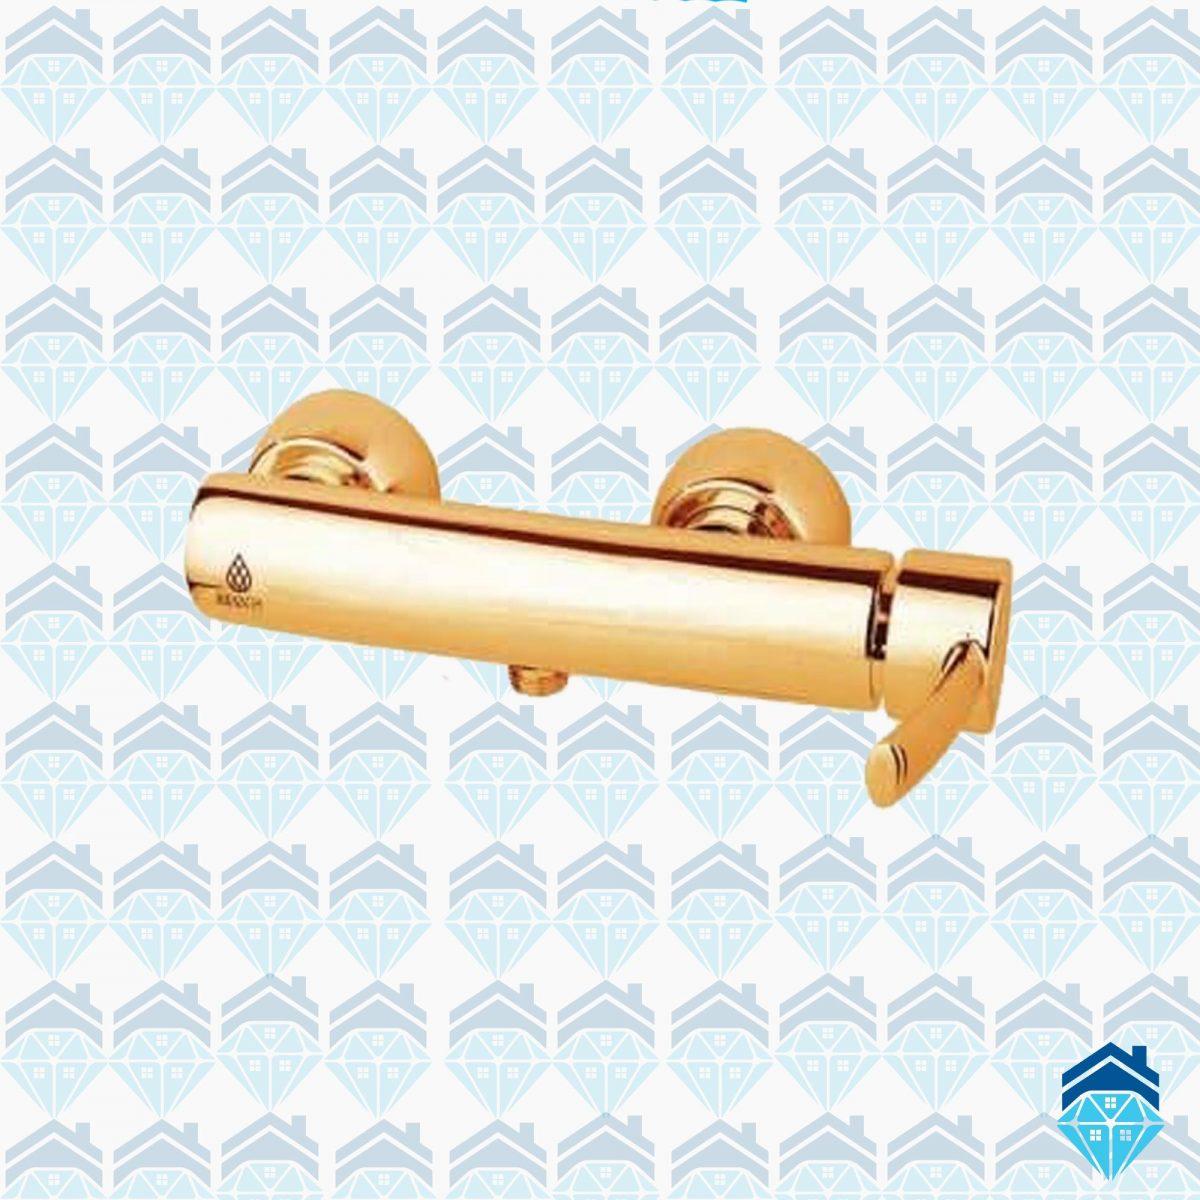 شیر توالت کیان مدل سورنا